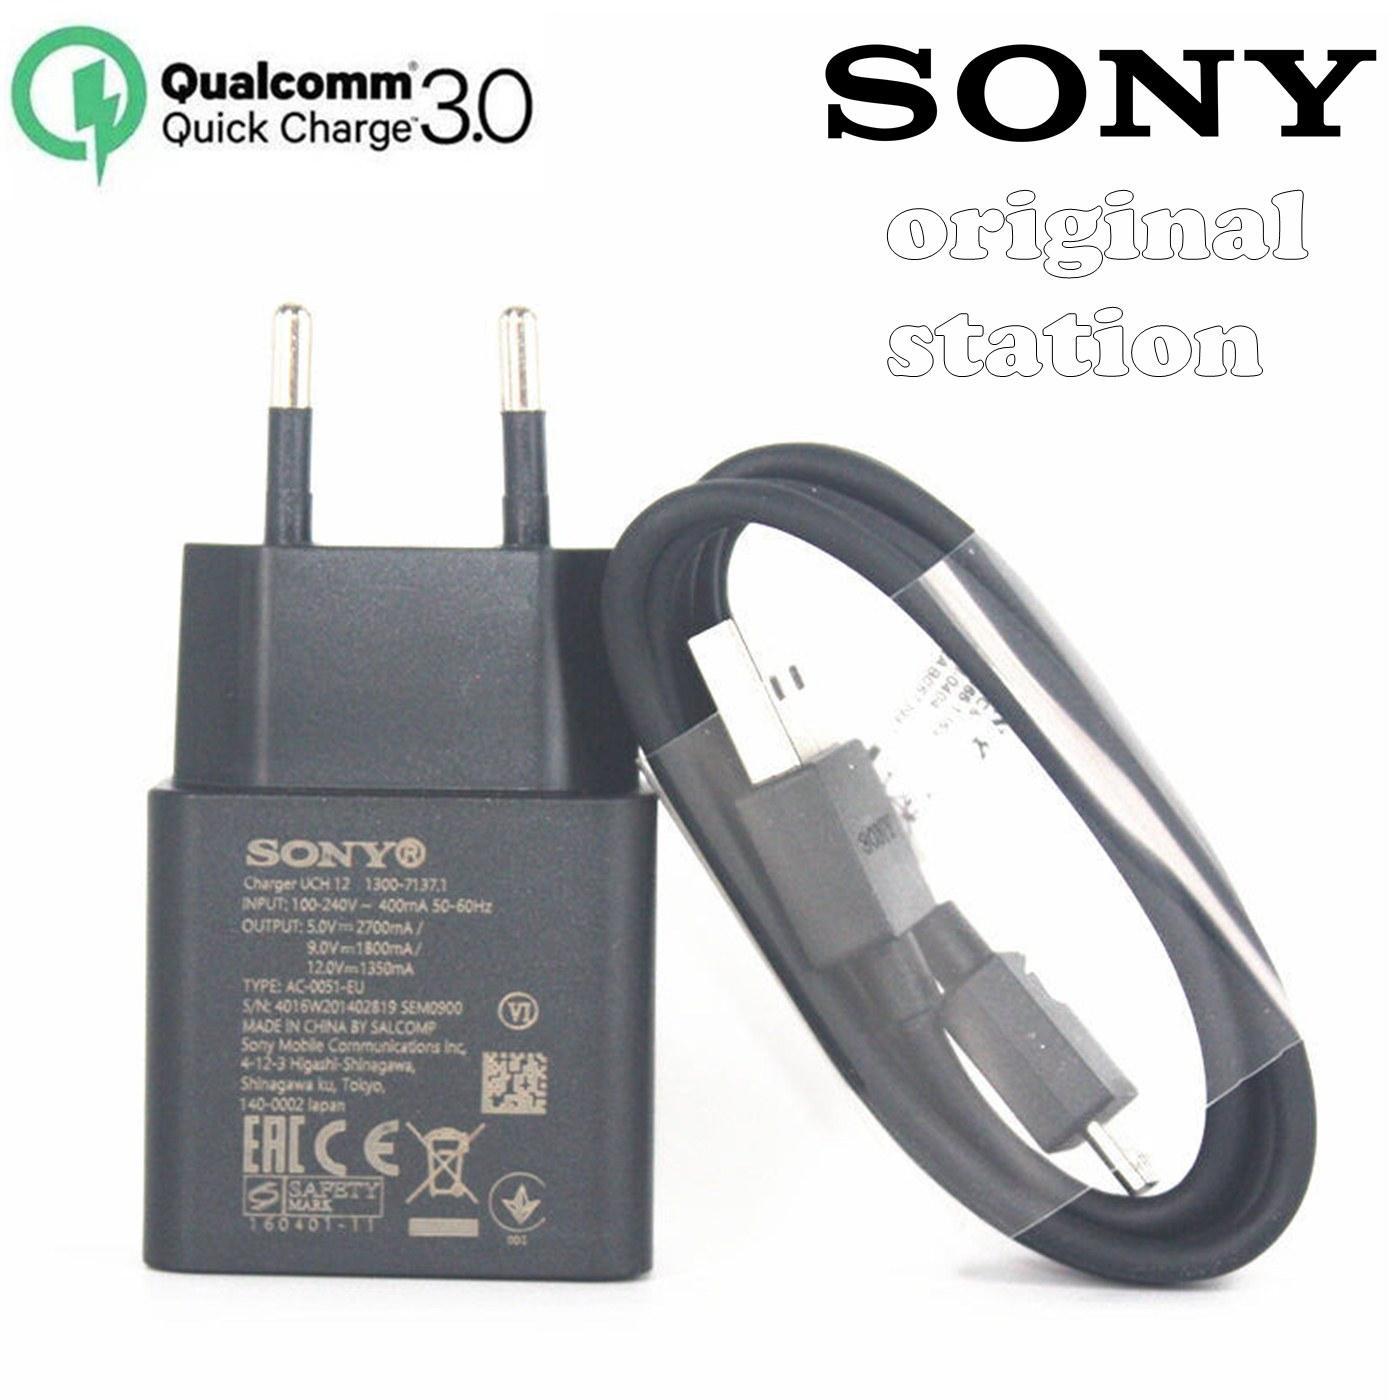 Sony Qualcomm Quick Charger 3.0 Type C Model UCH 12 For Sony Xperia XZ XZ1 XZs